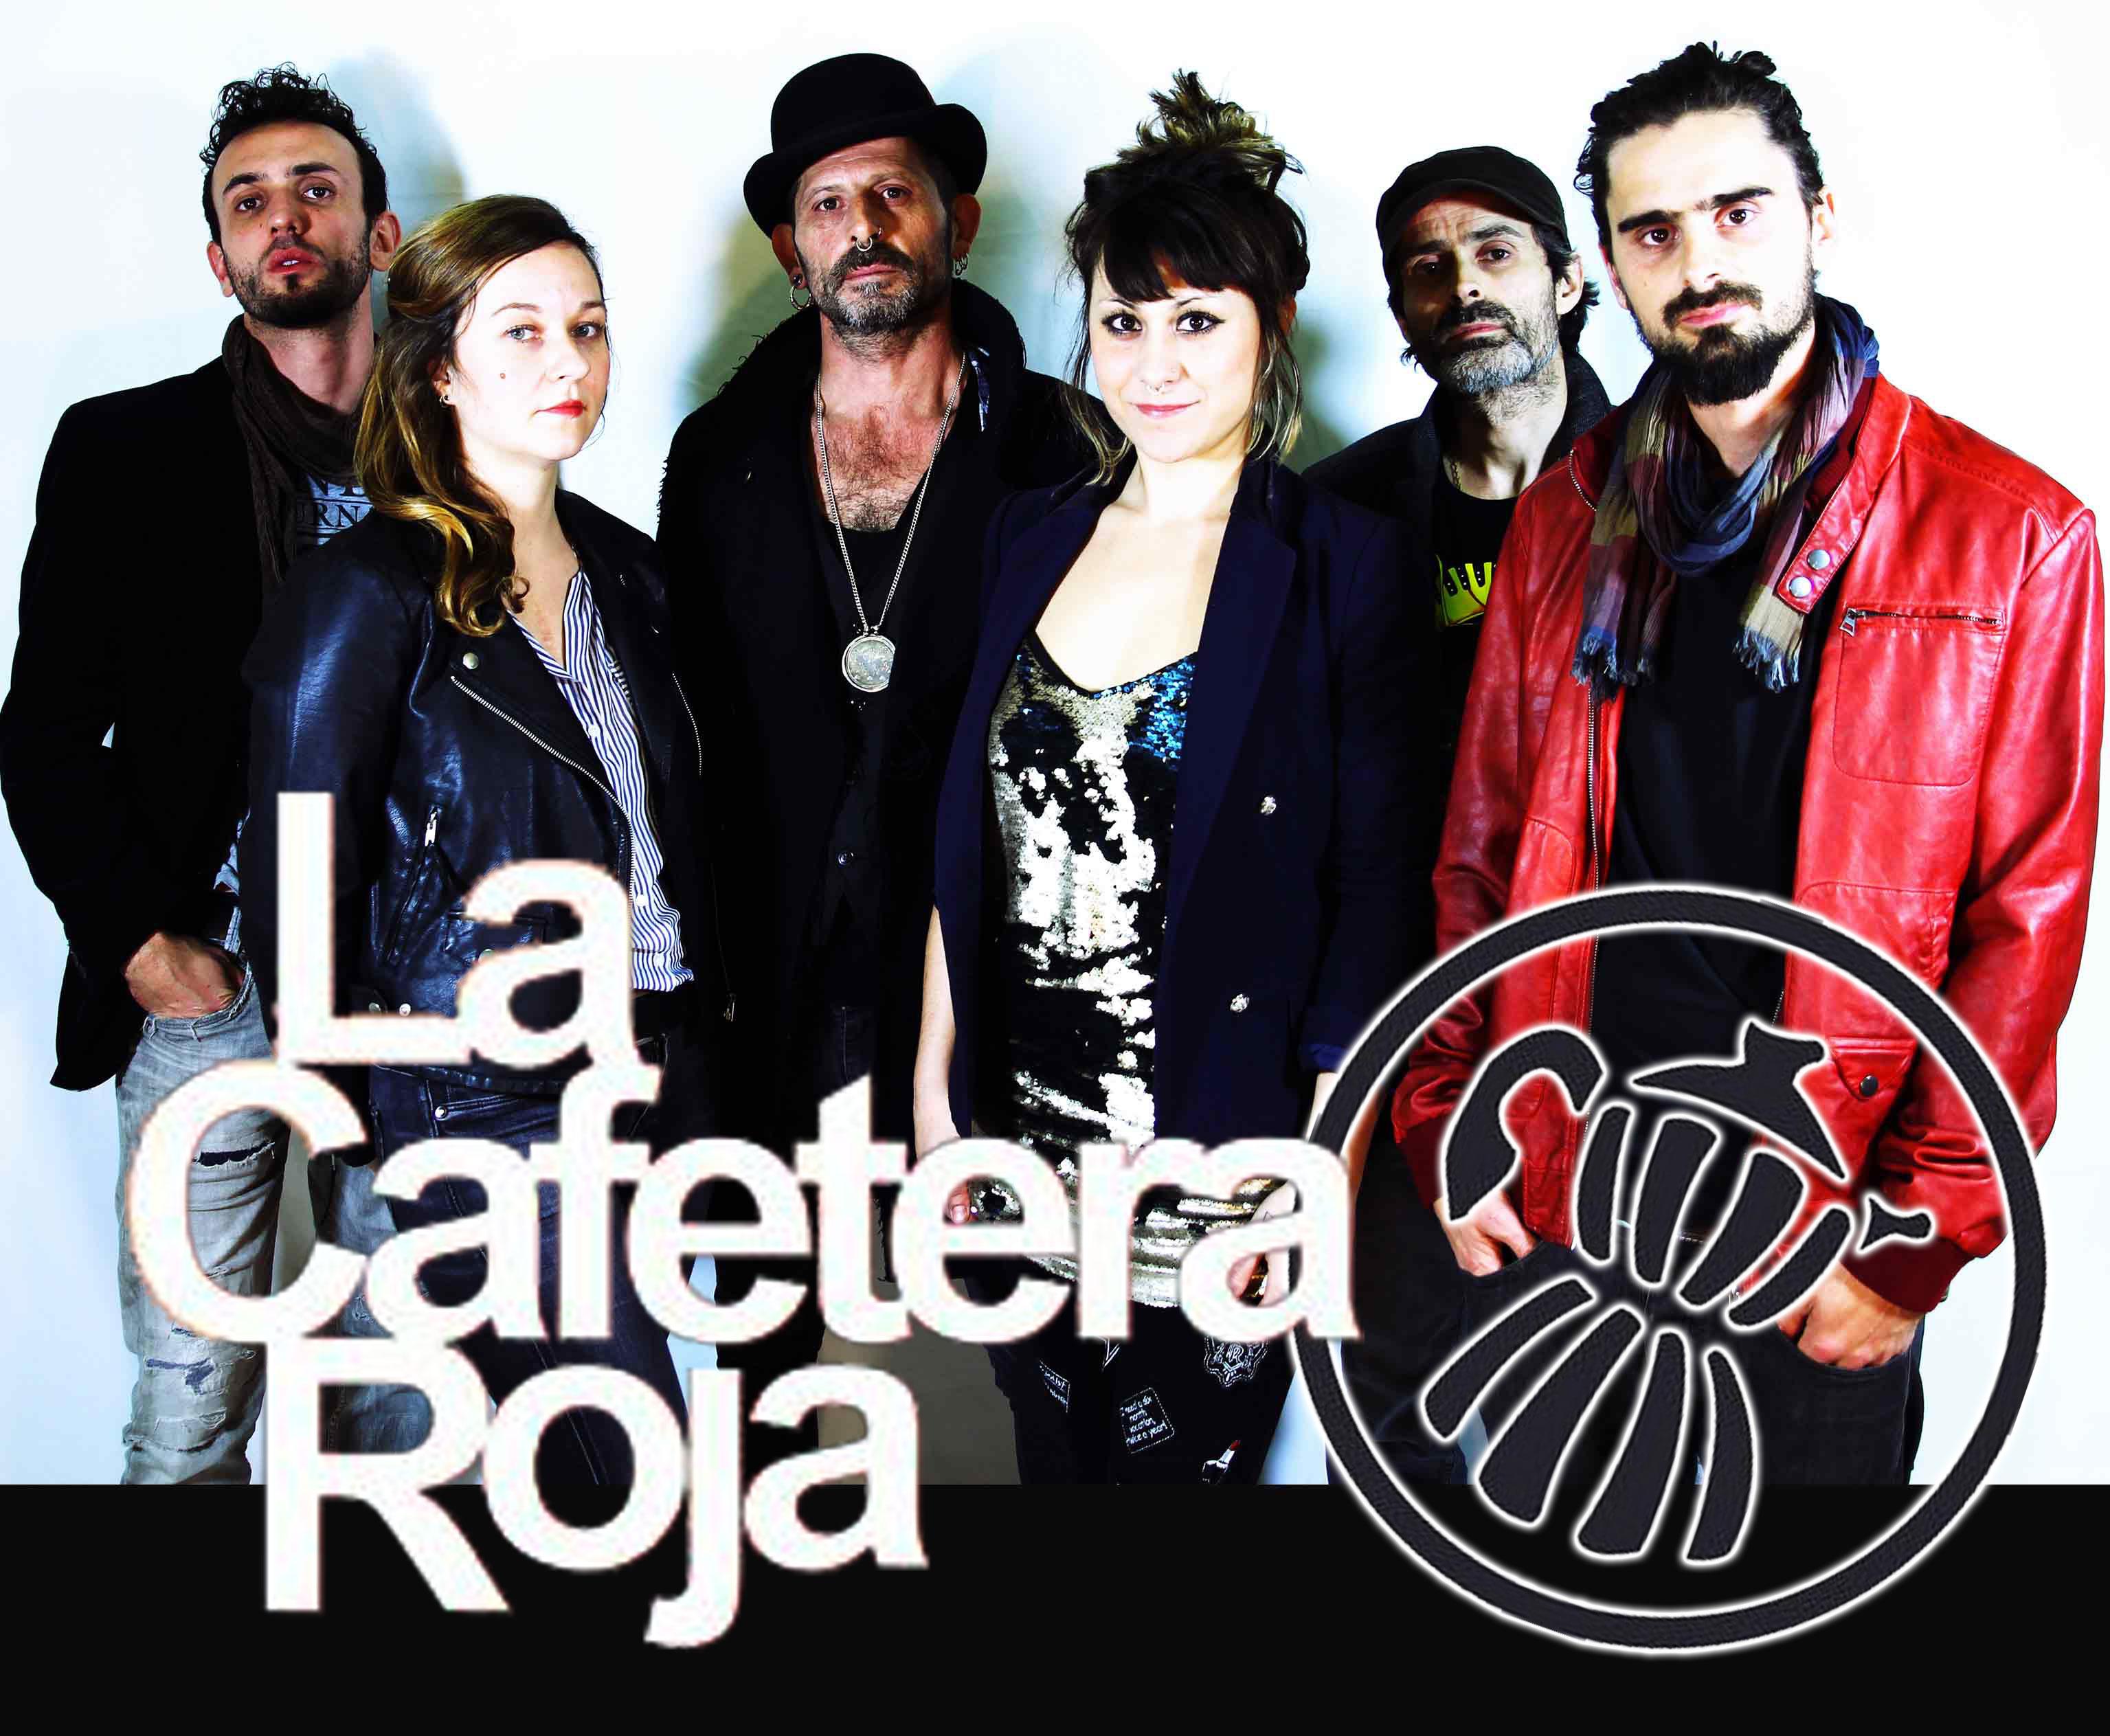 Café Saalekiez, Felsenbühne, La Cafetera Roja